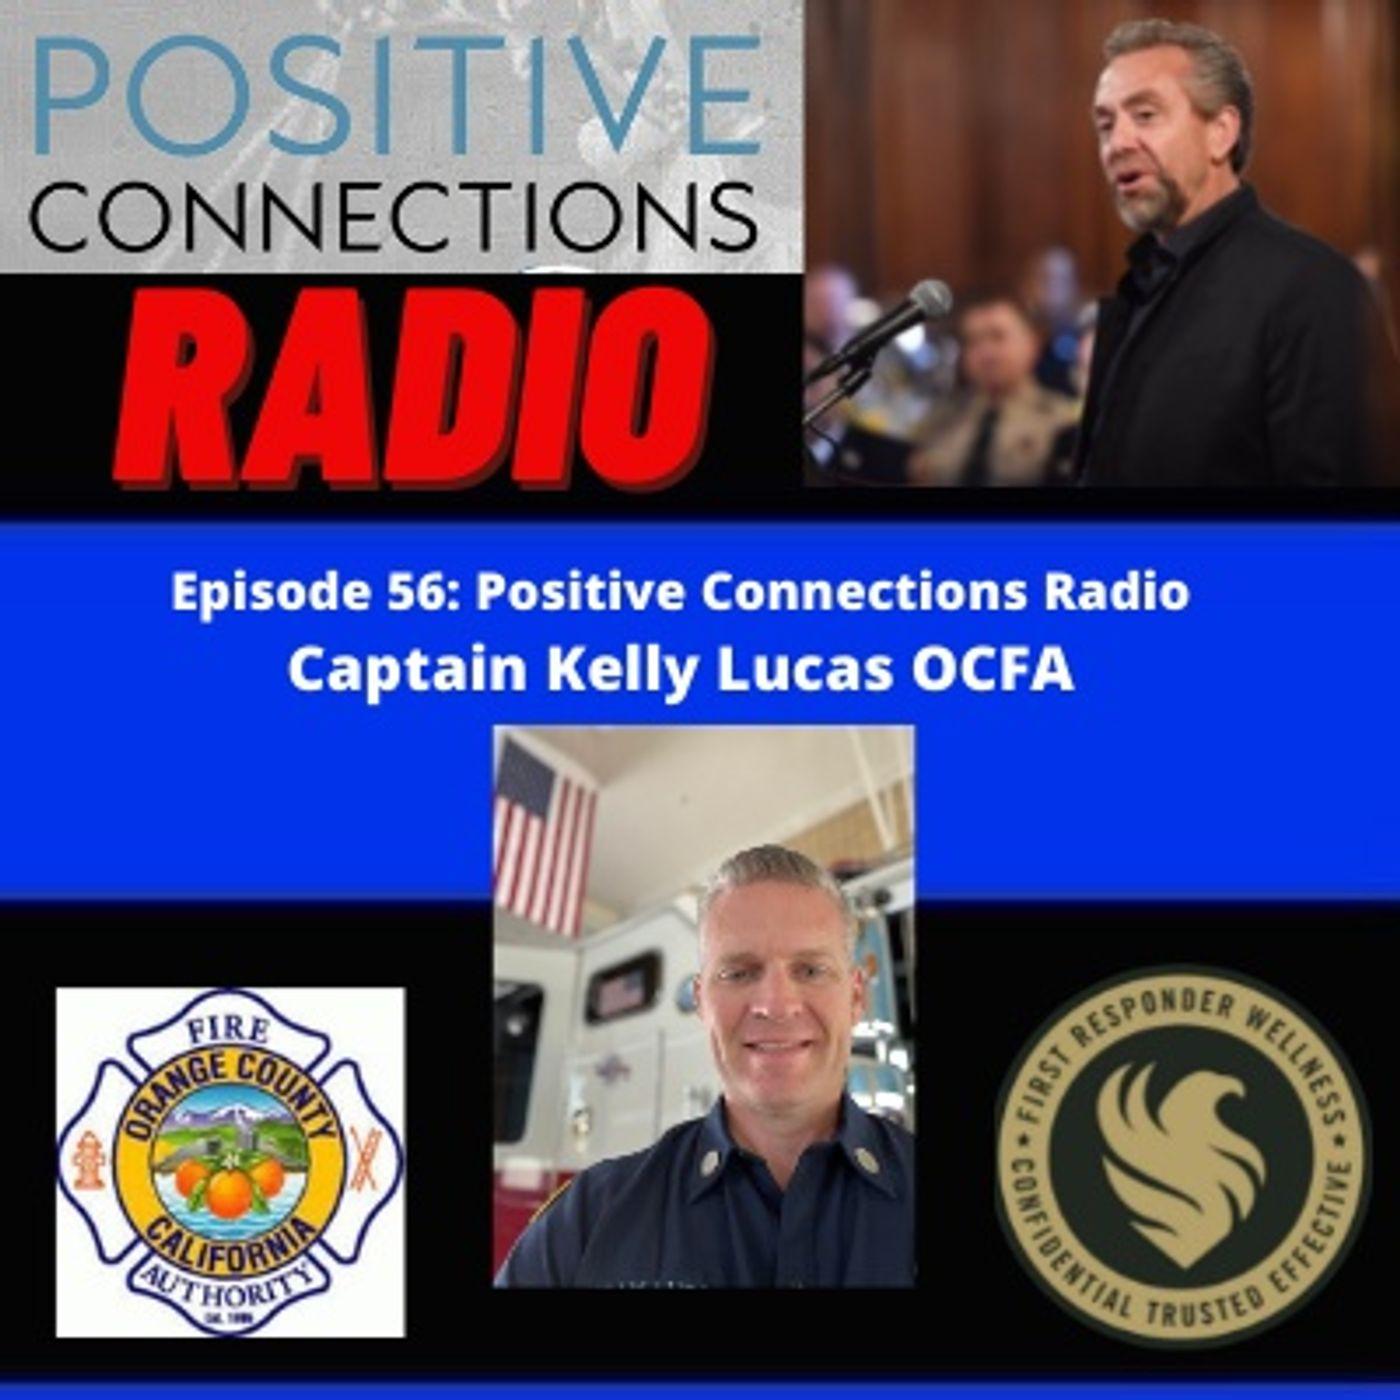 Captain Kelly Lucas OCFA